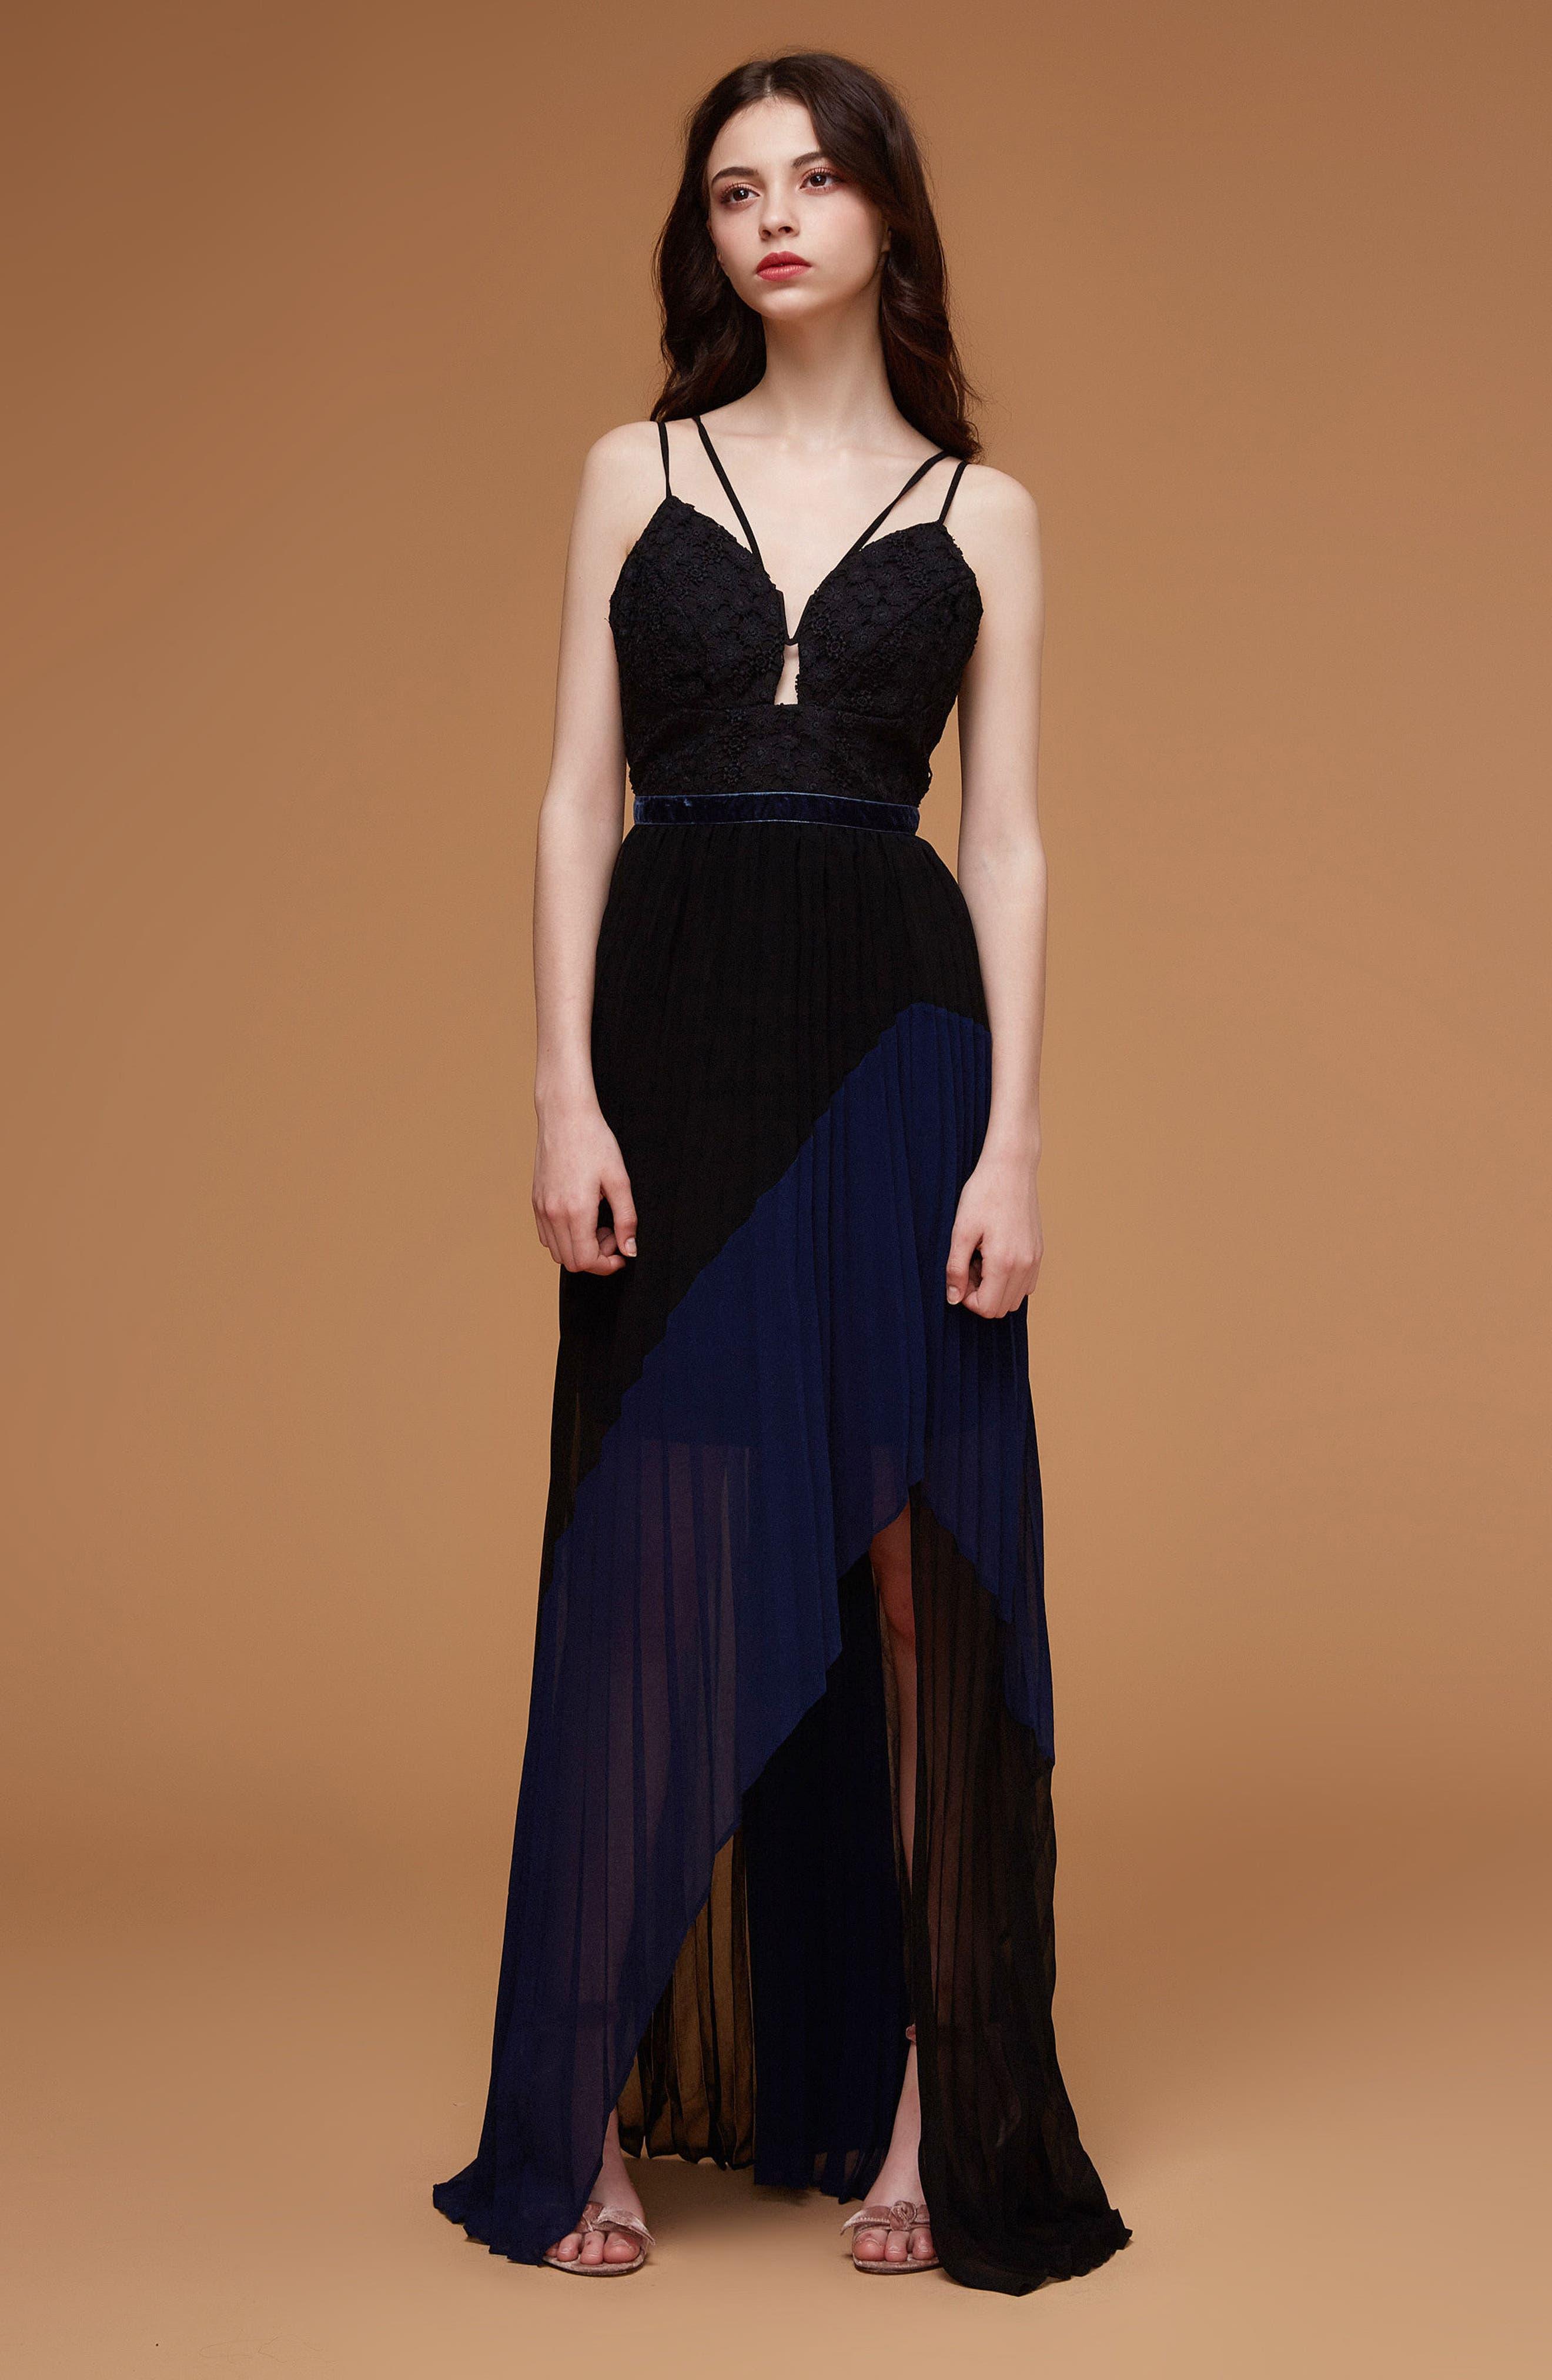 Nealea Pleat Chiffon Gown,                             Alternate thumbnail 2, color,                             Black/ Navy